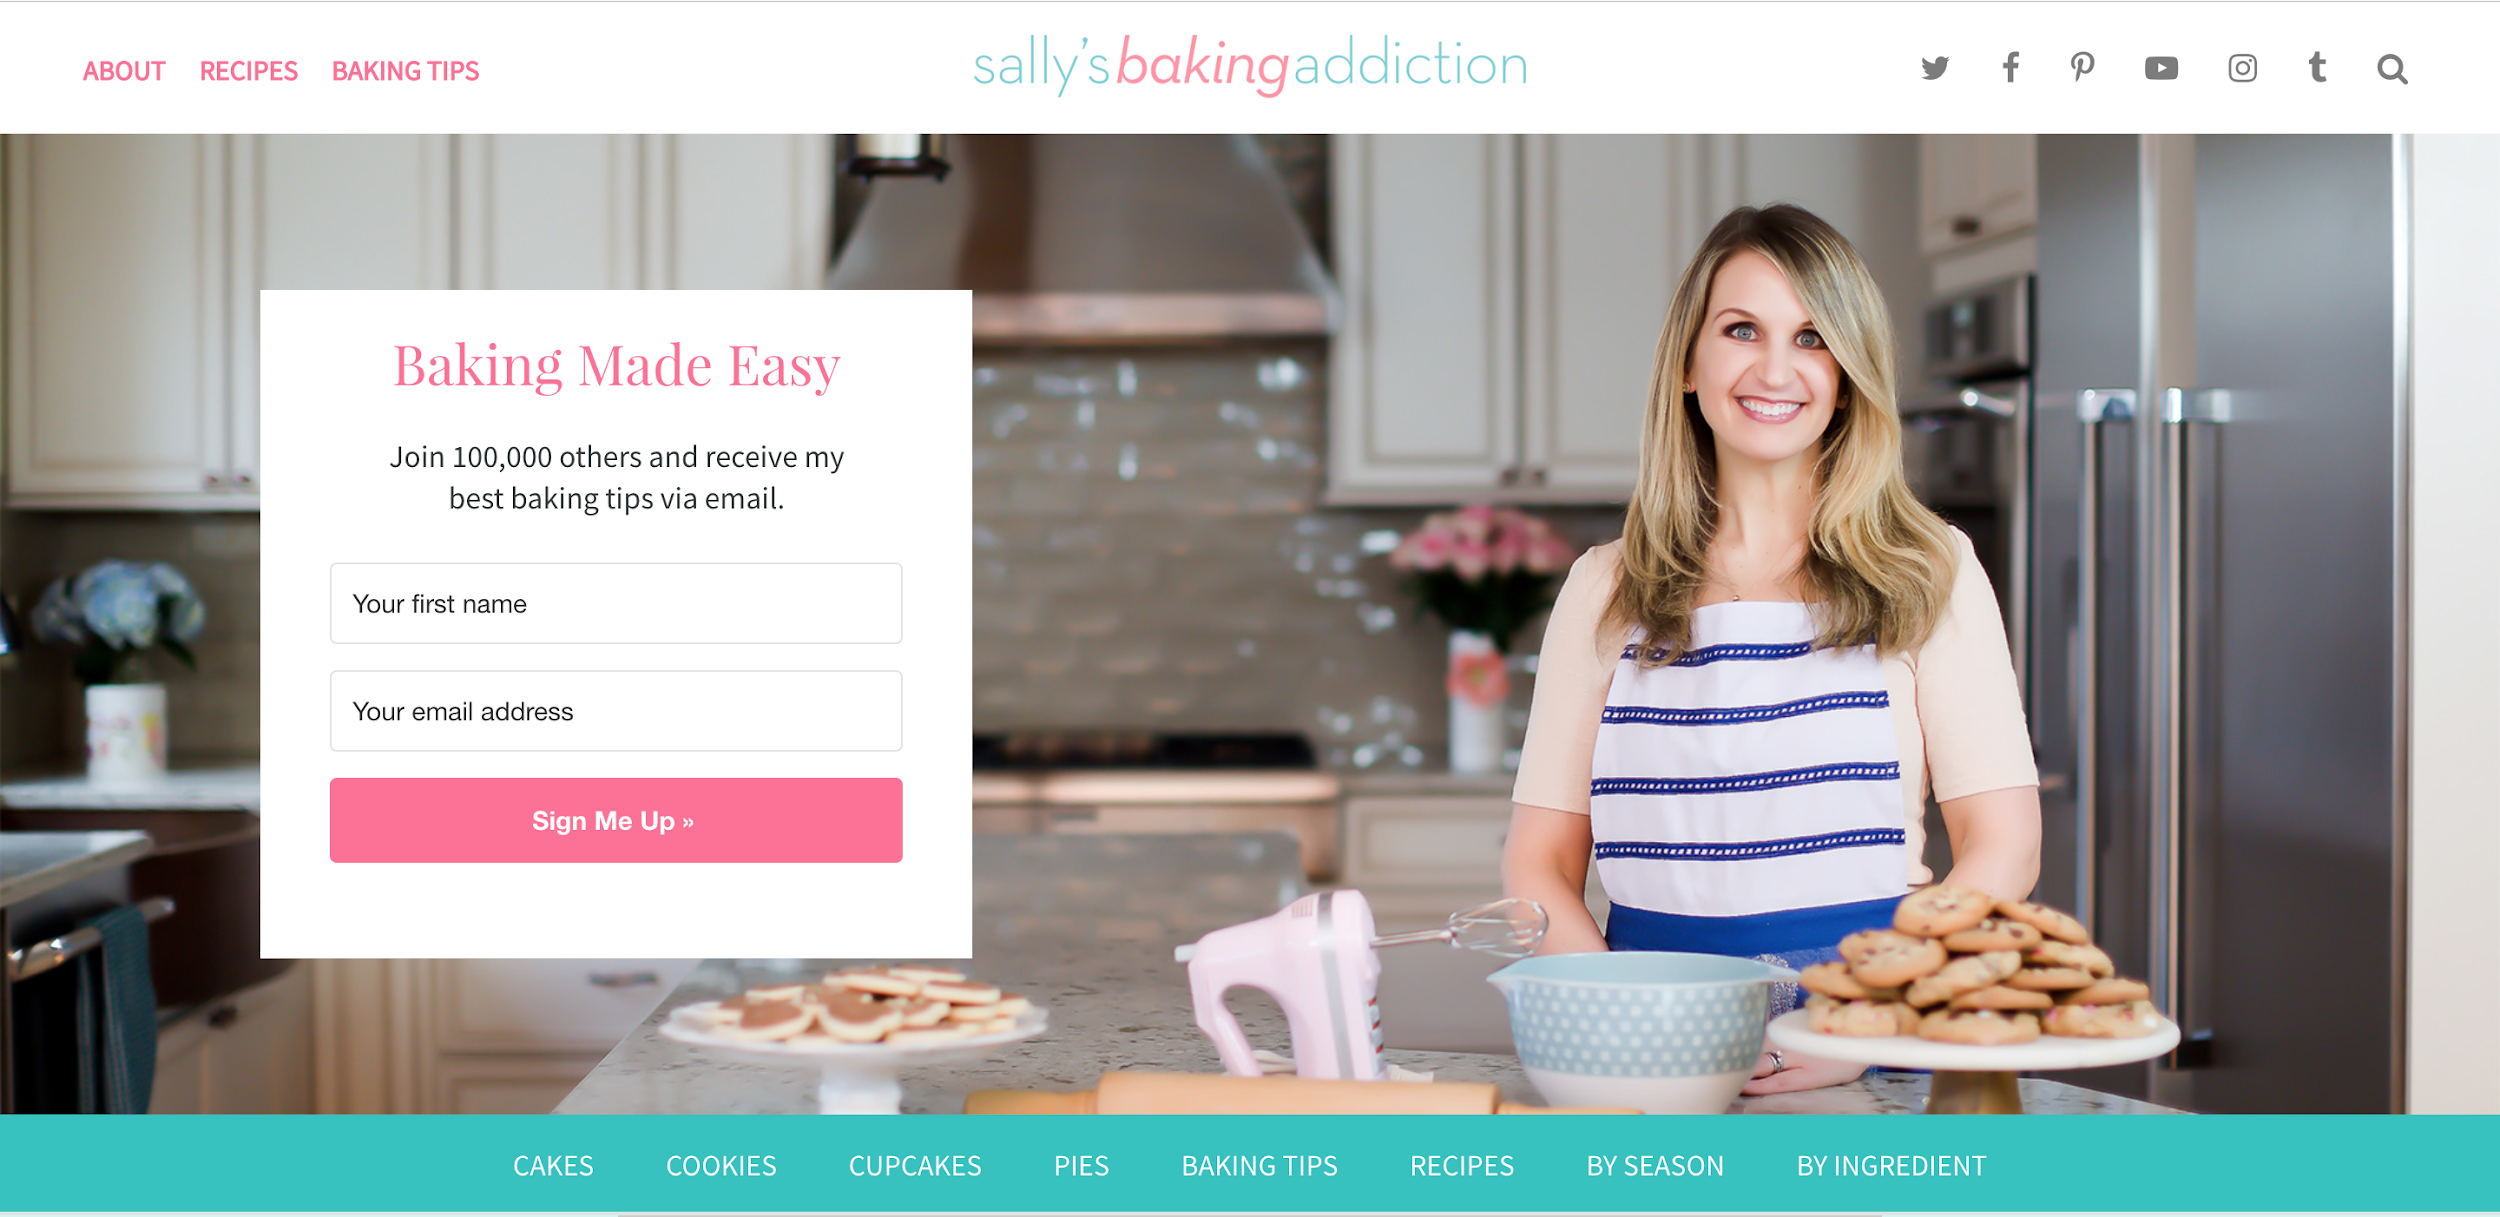 sally's baking addiction blog